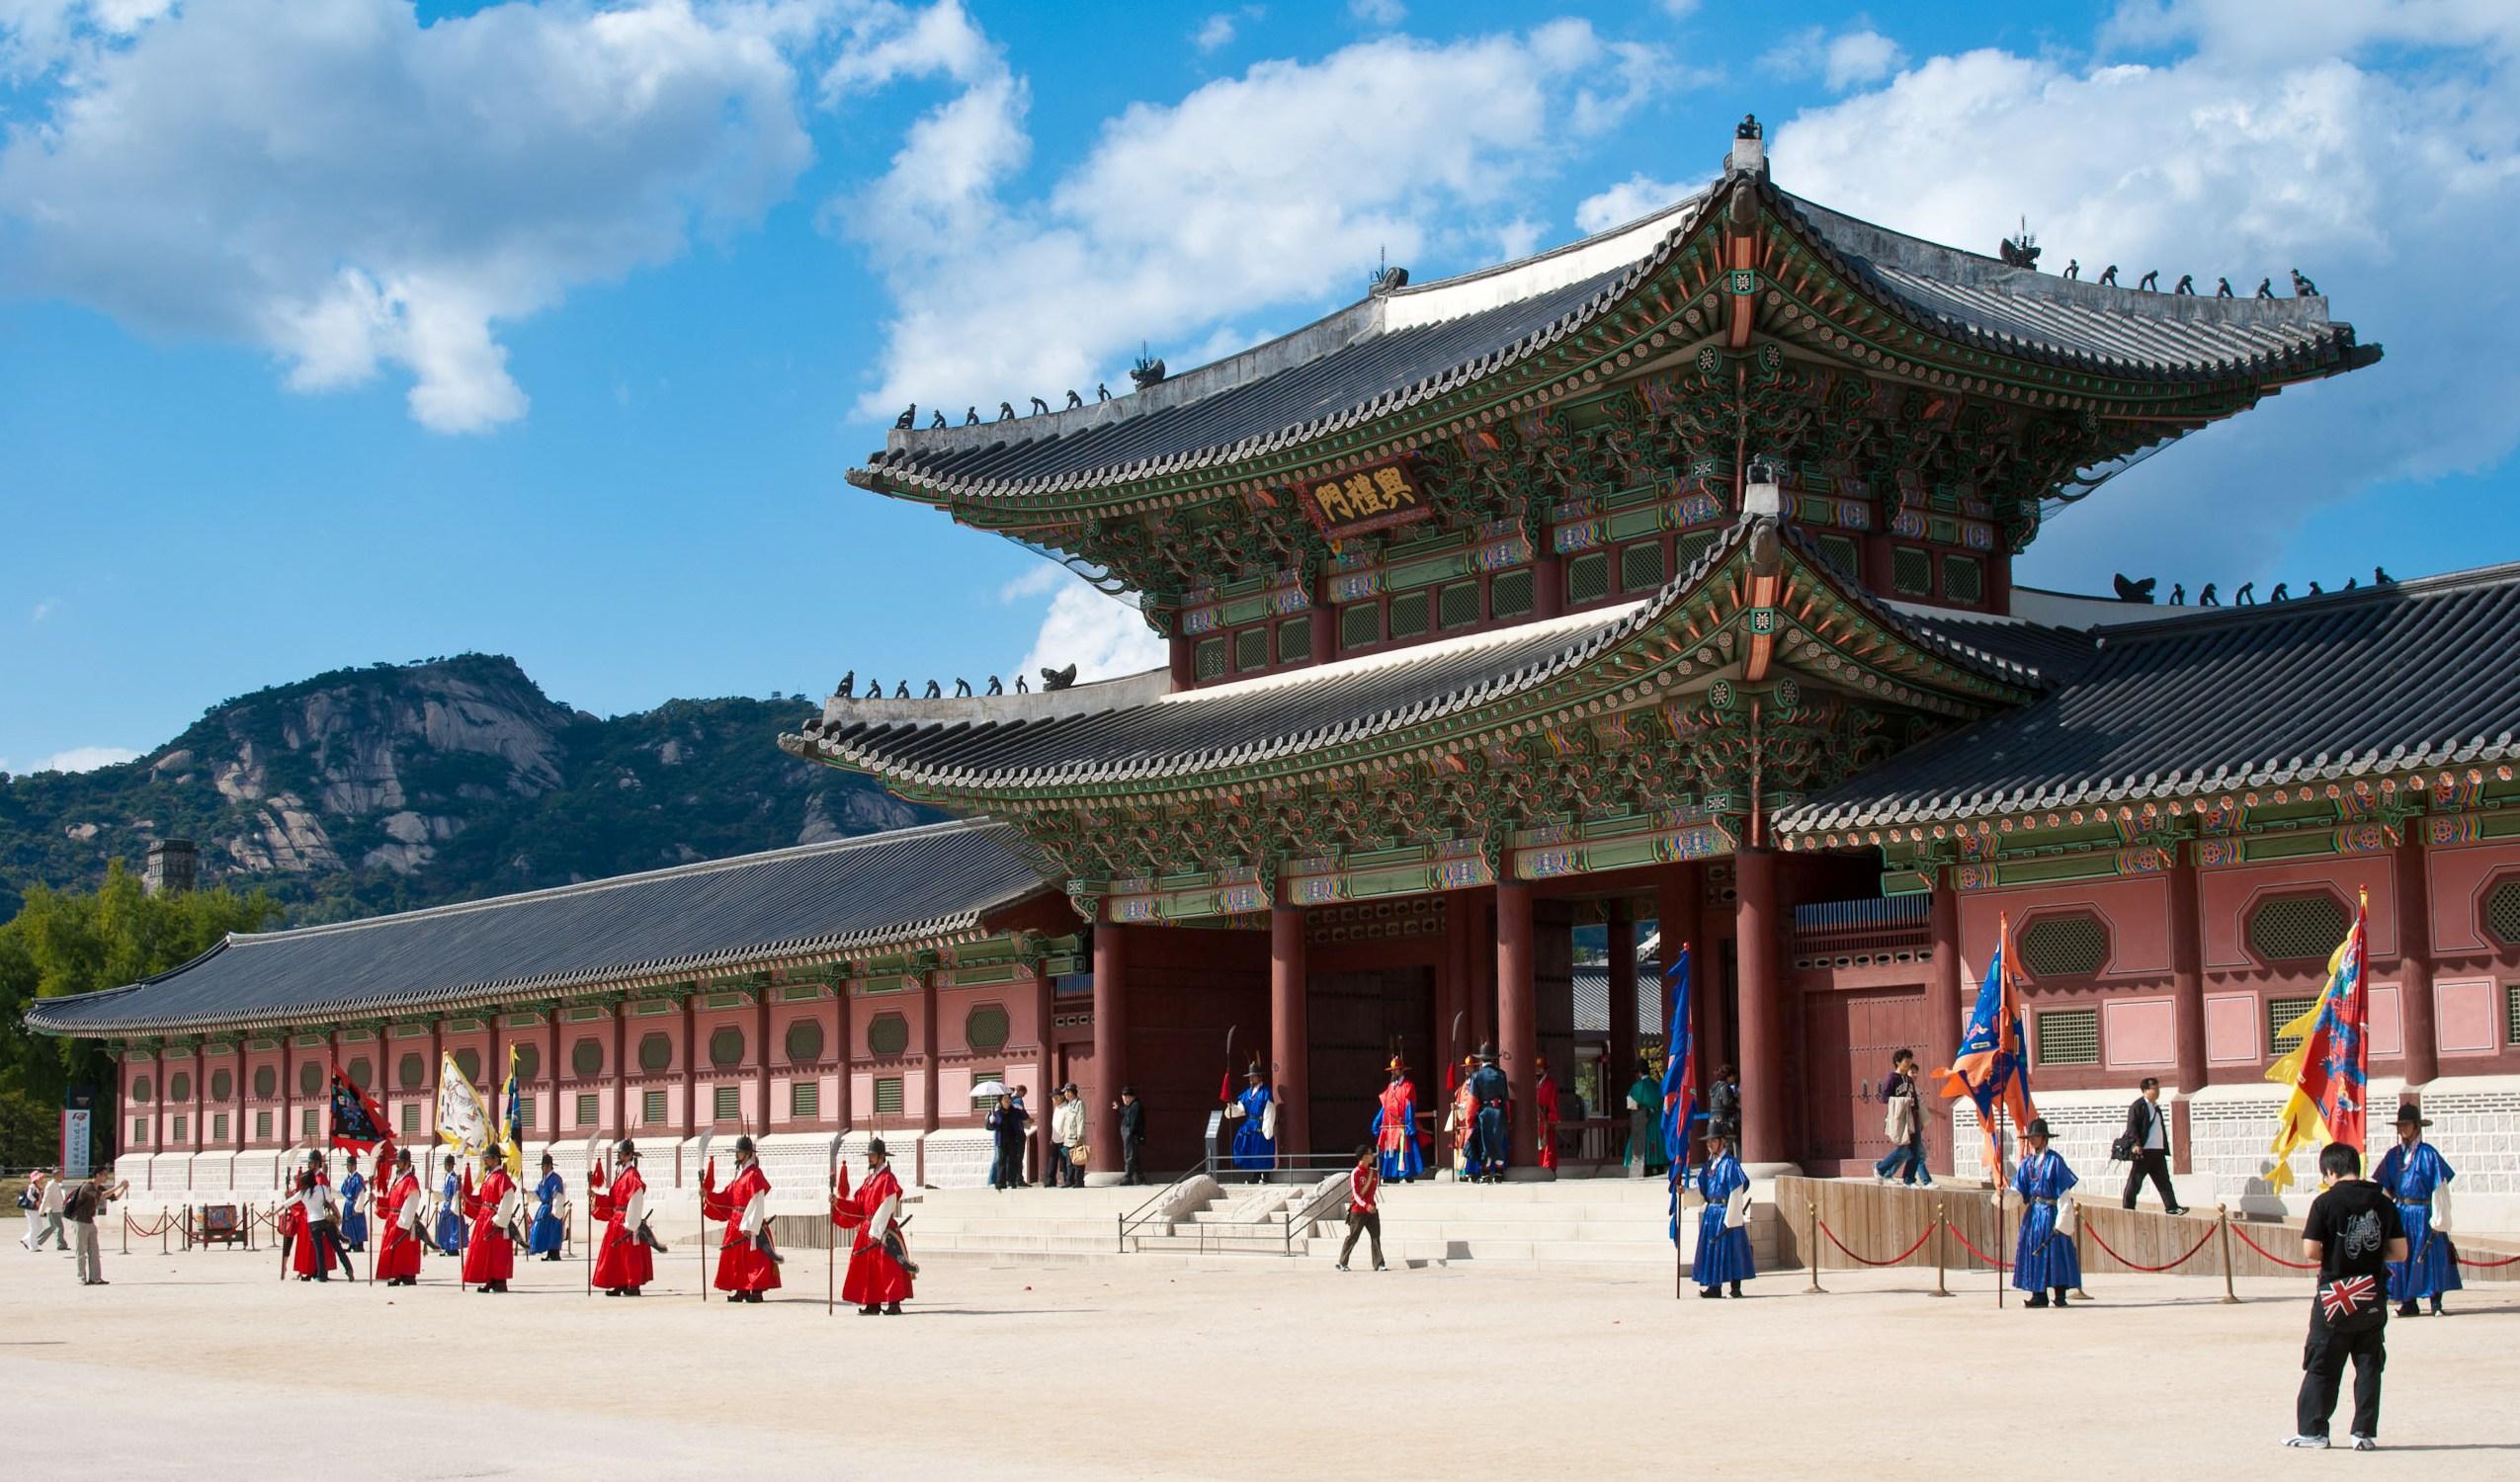 Tempat Wisata Korea, Check Out Tempat Wisata Korea : cnTRAVEL